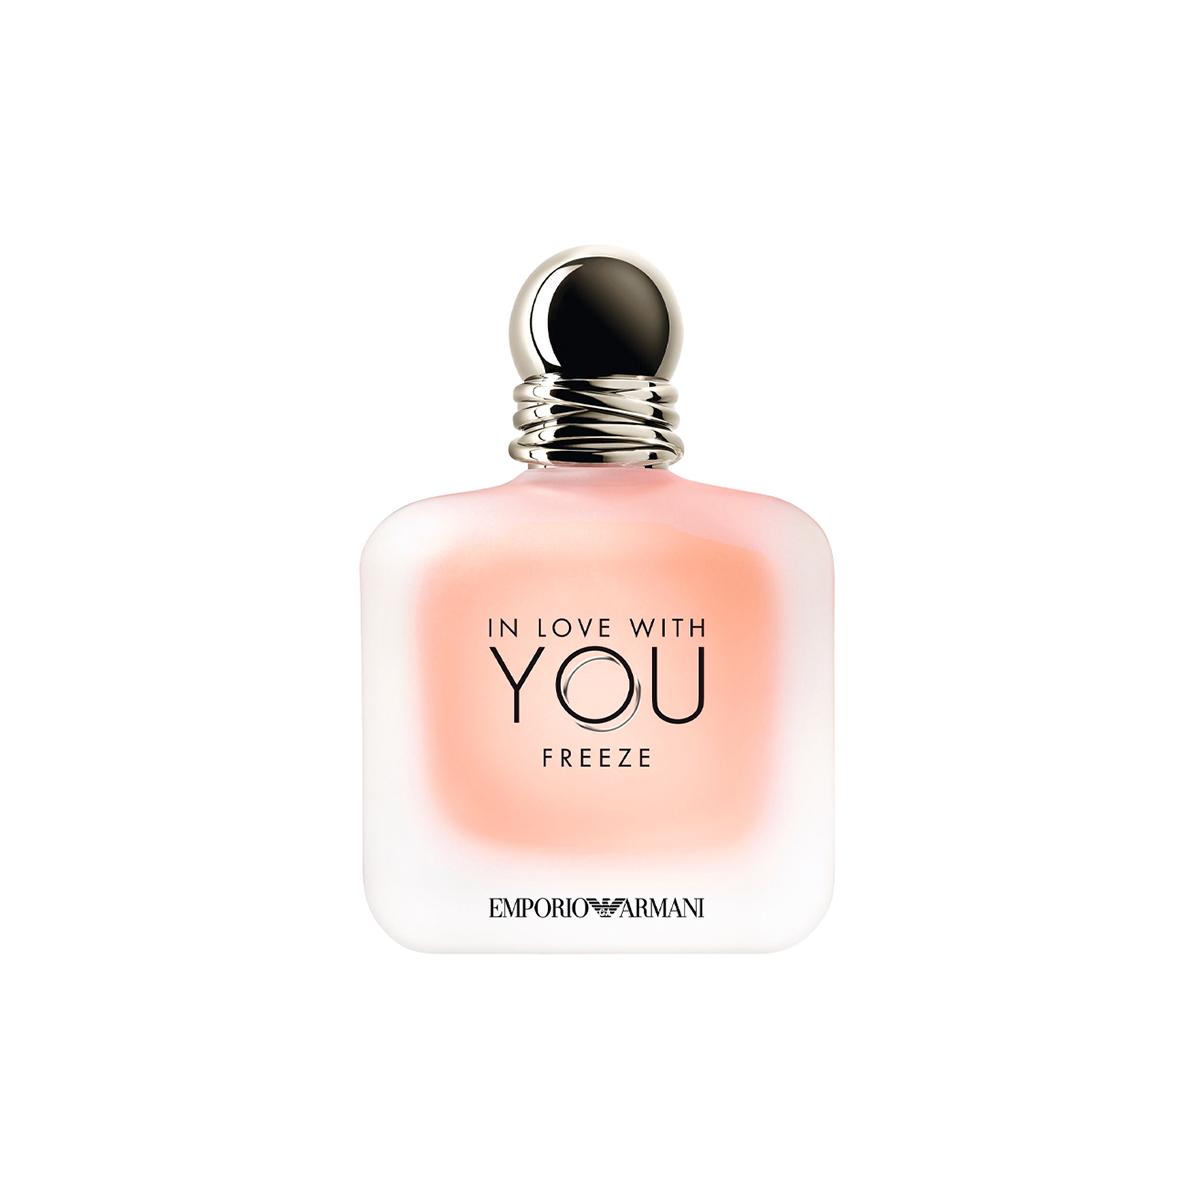 Emporio armani in love with you freeze eau de parfum 50ml vaporizador